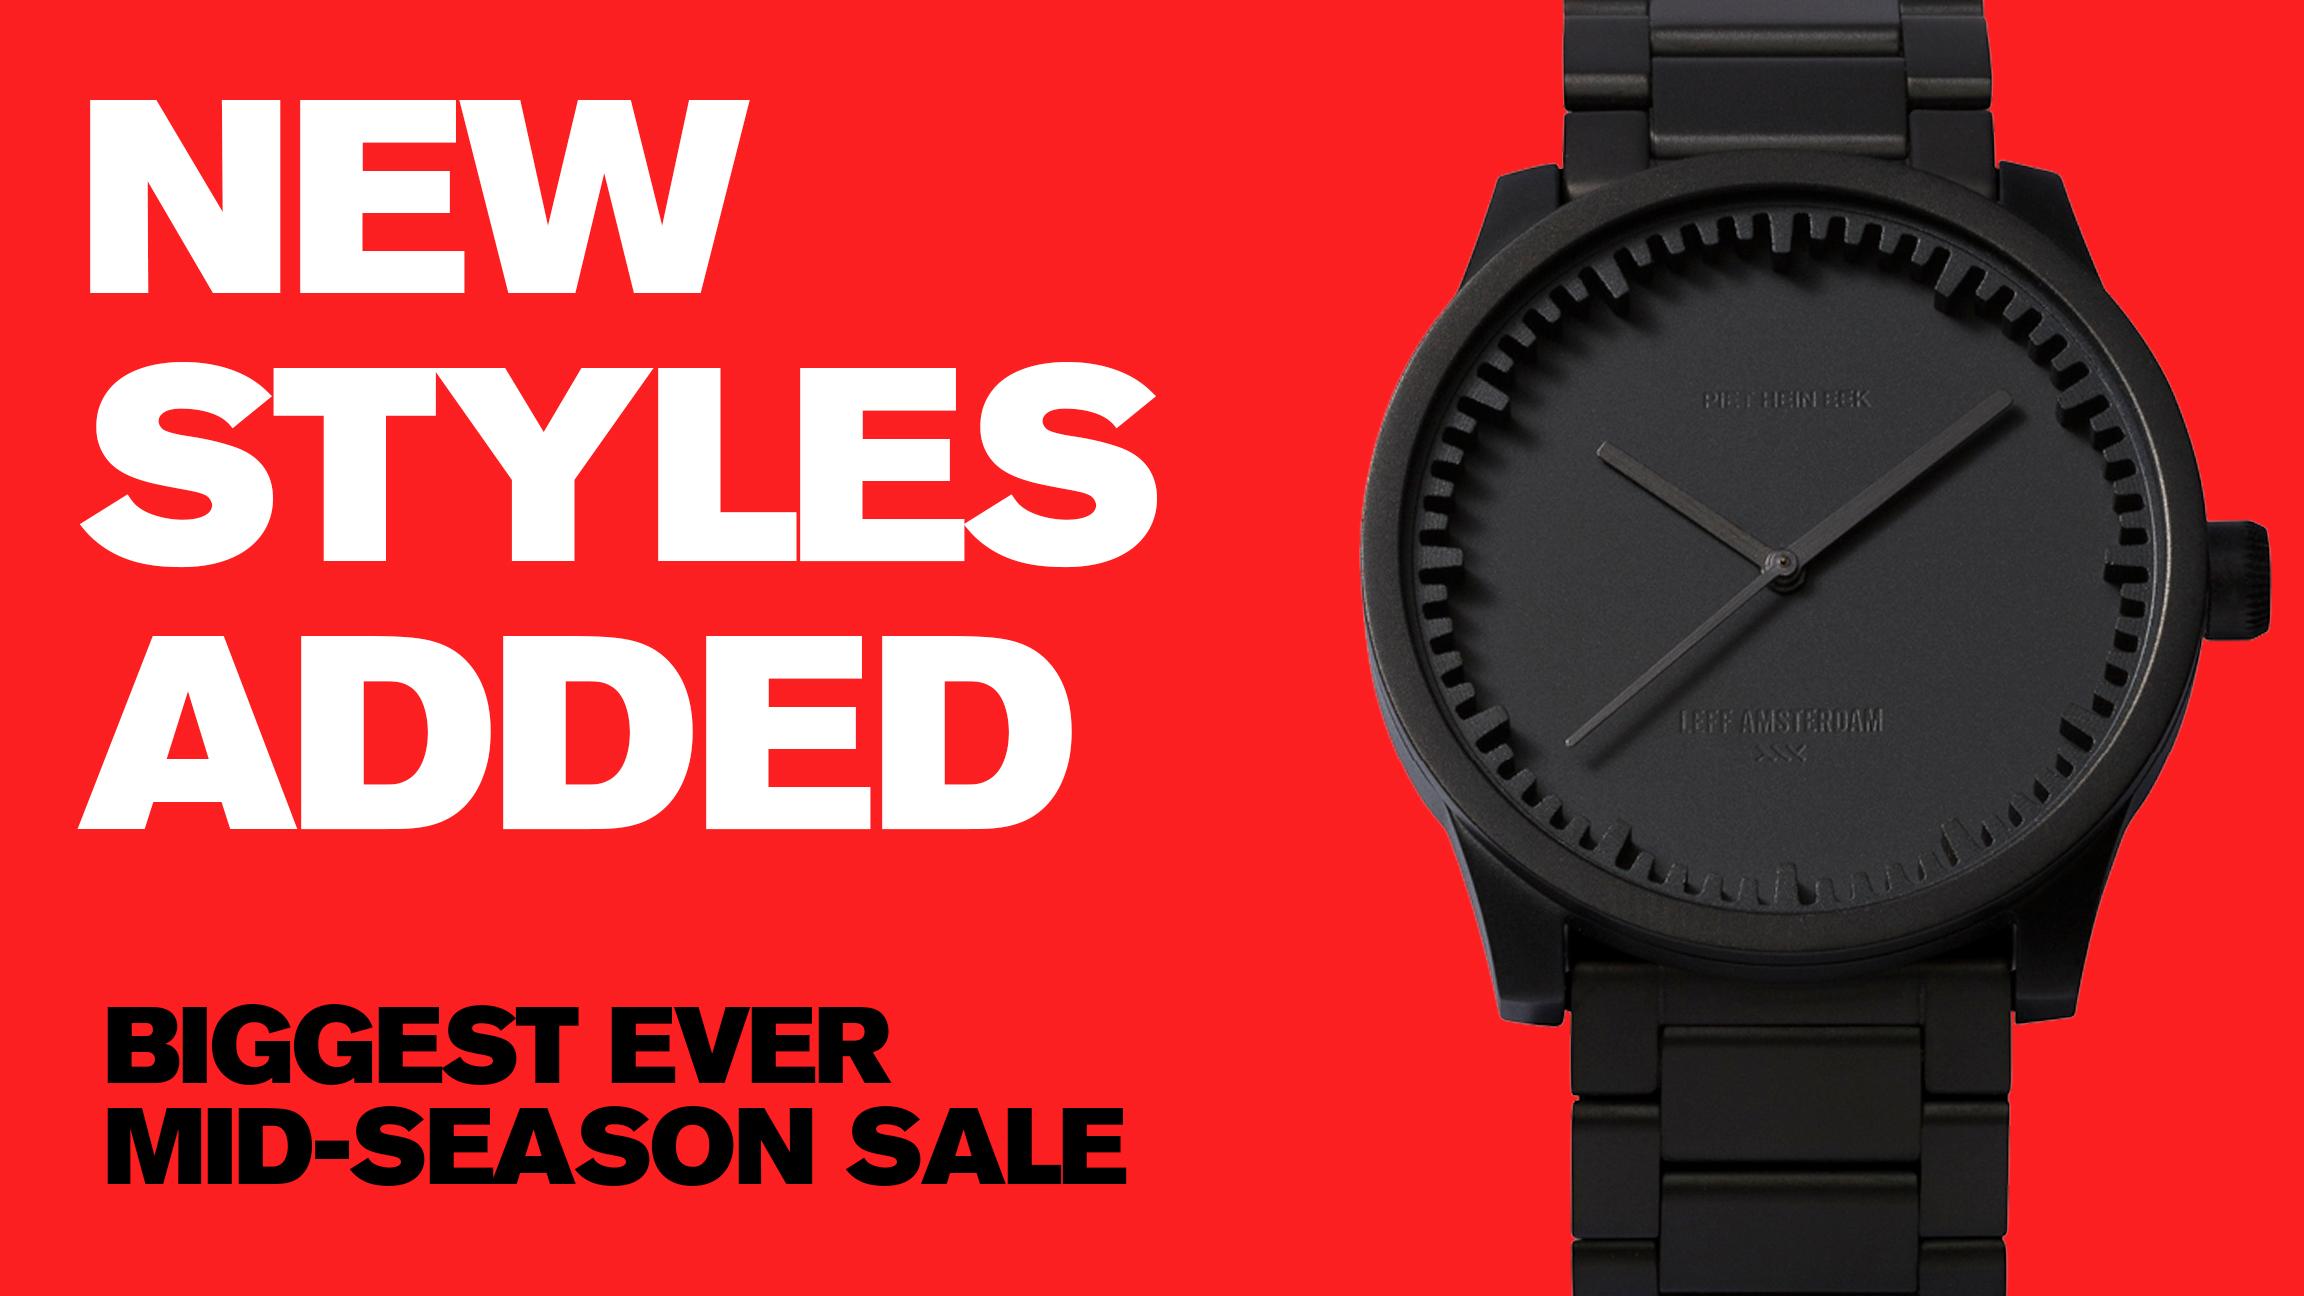 Watches designed by Nendo and Piet Hein Eek added to Dezeen Watch Store sale